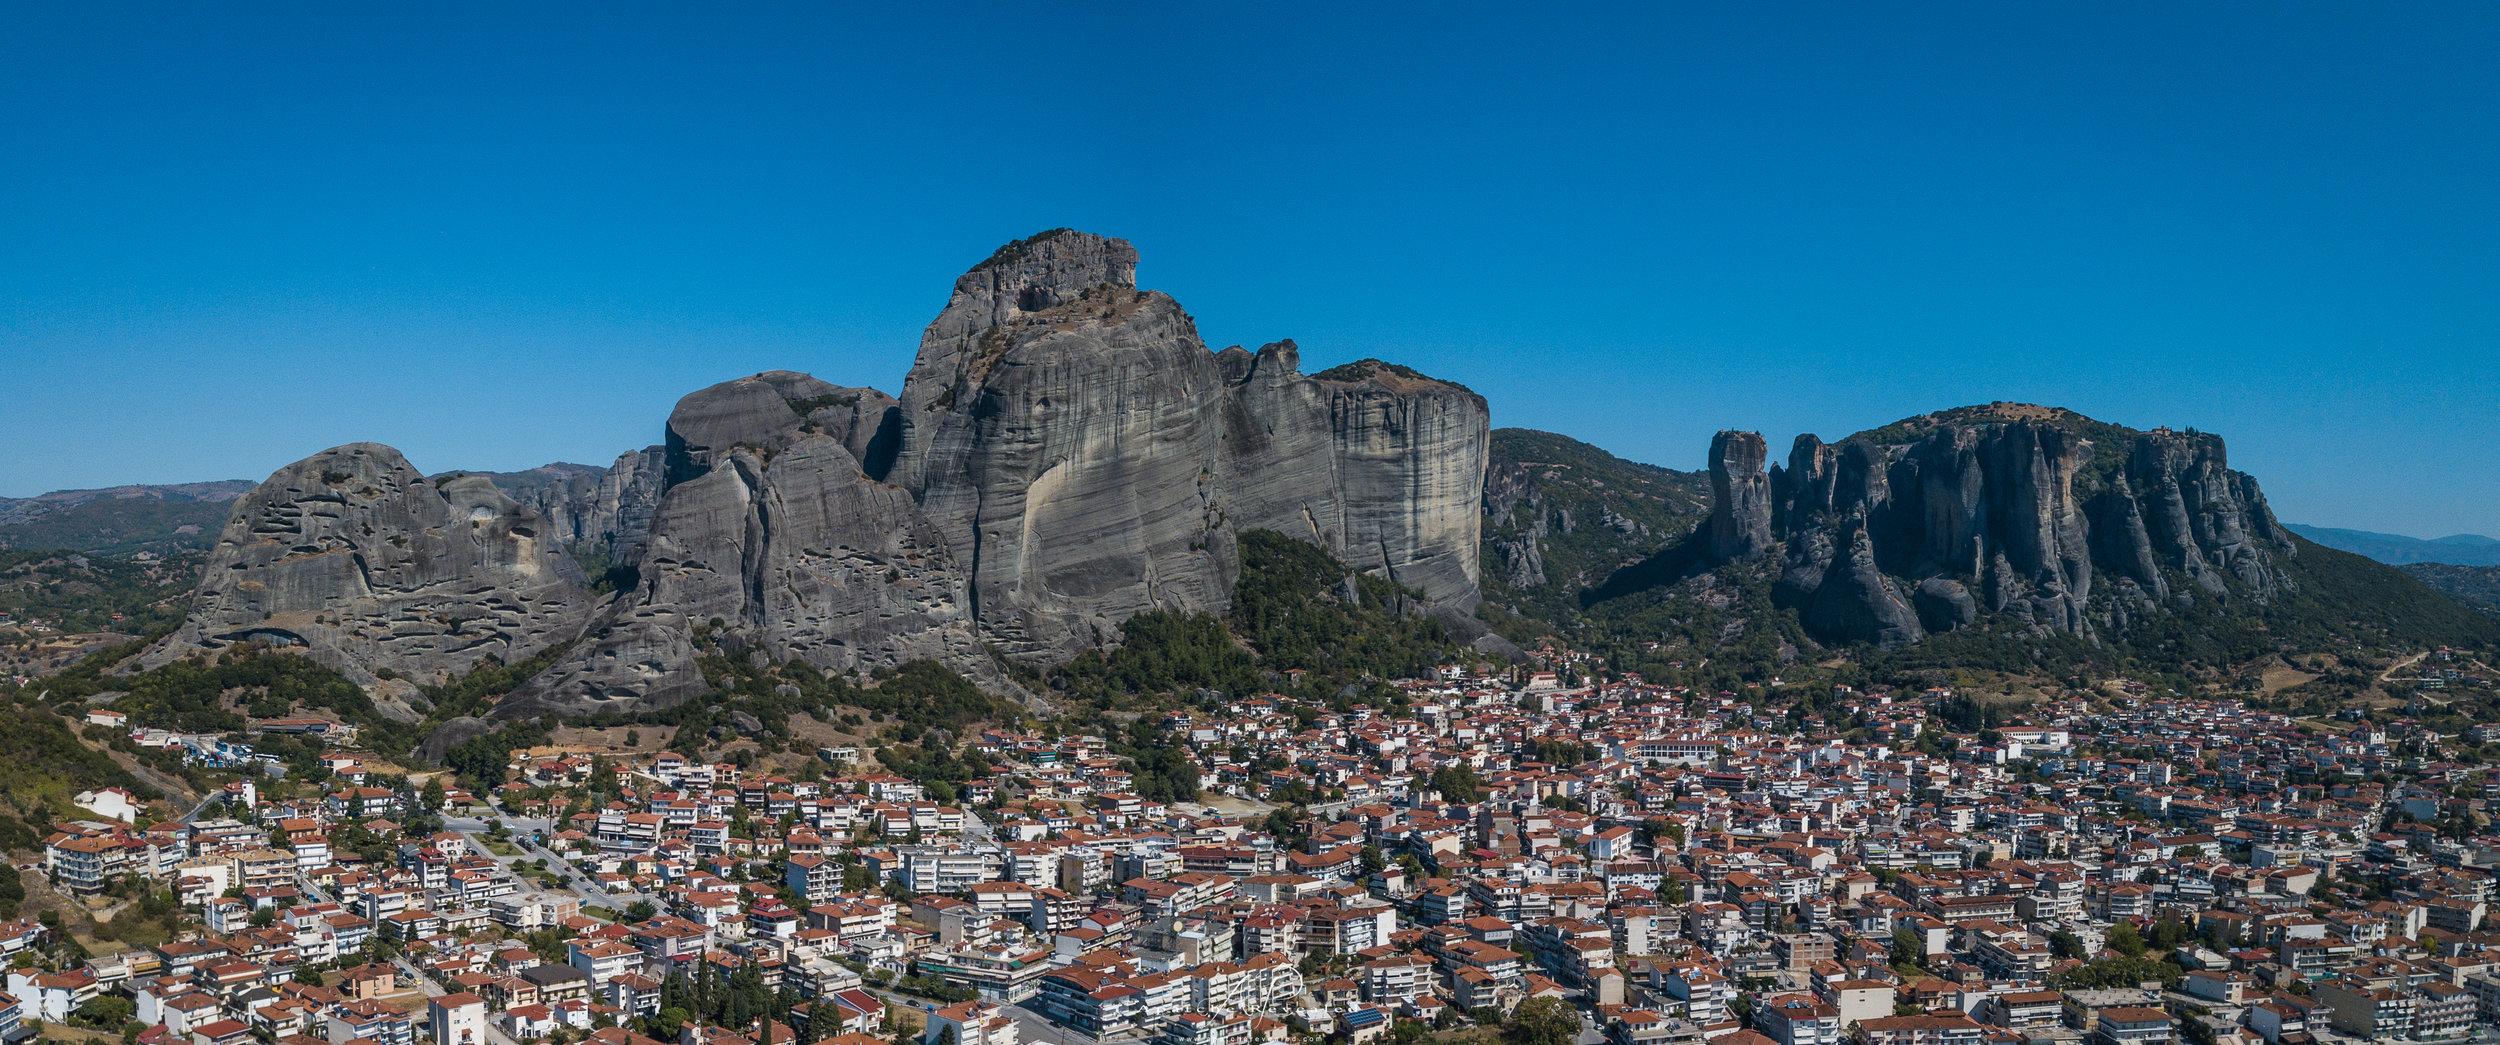 Meteora Town (Kamabalama).jpg